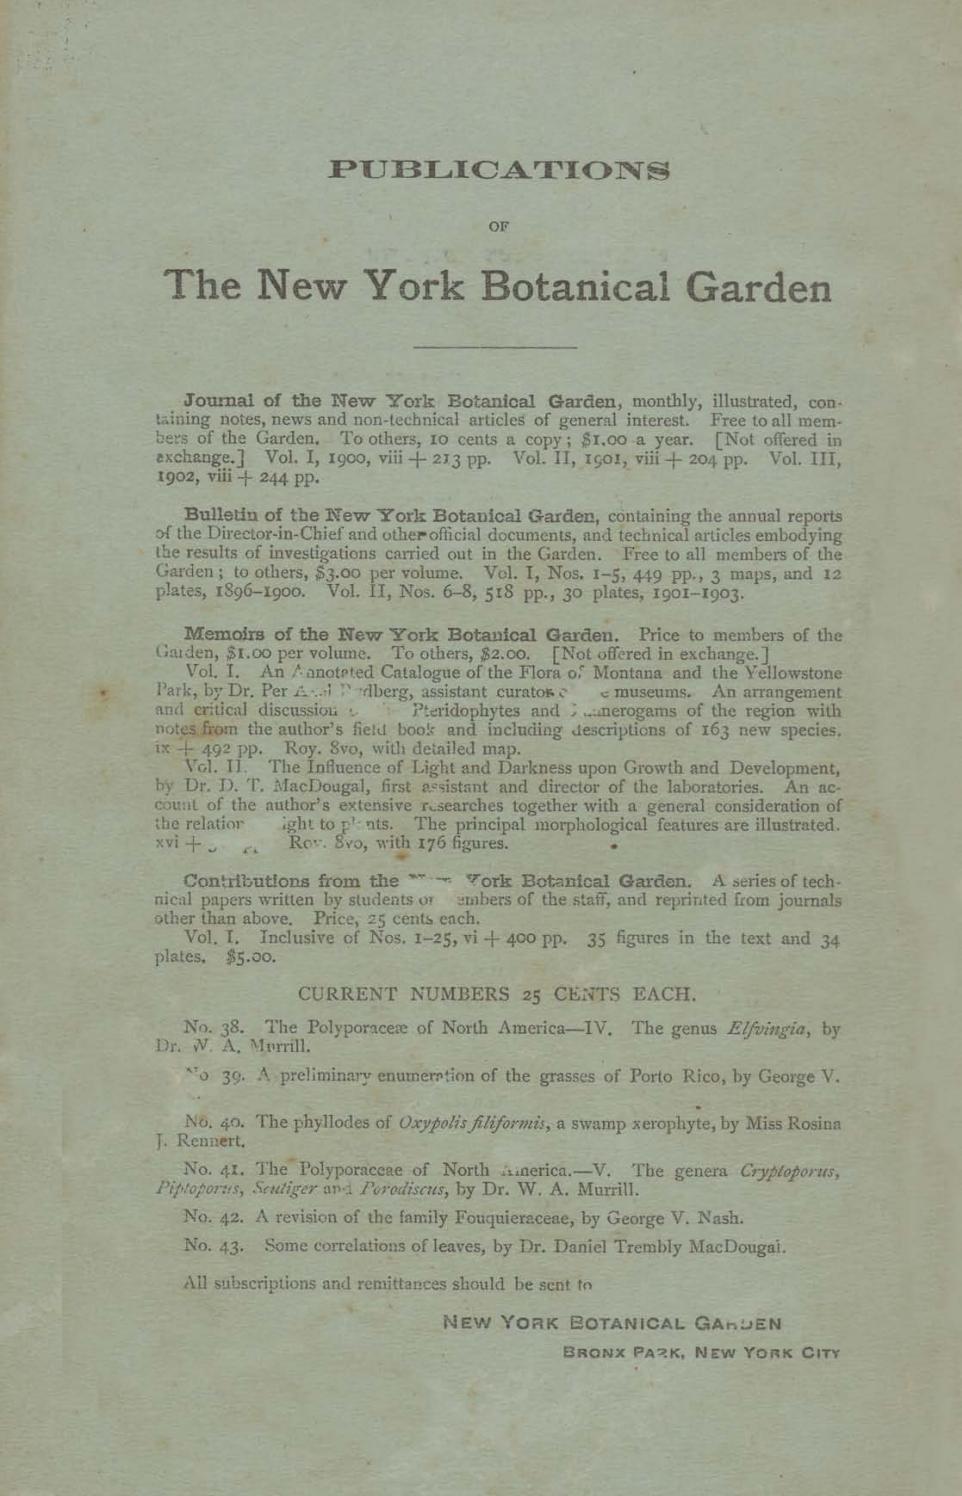 Map Of New York Botanical Garden.Journal Of The New York Botanical Garden Vol 4 N 47 By